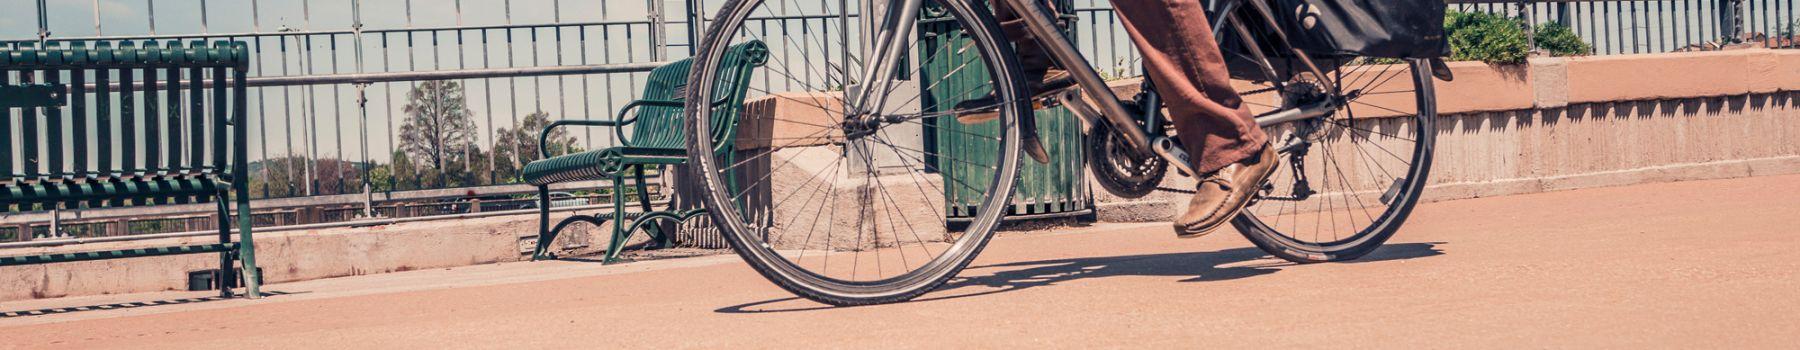 F_Mann_auf_Fahrrad